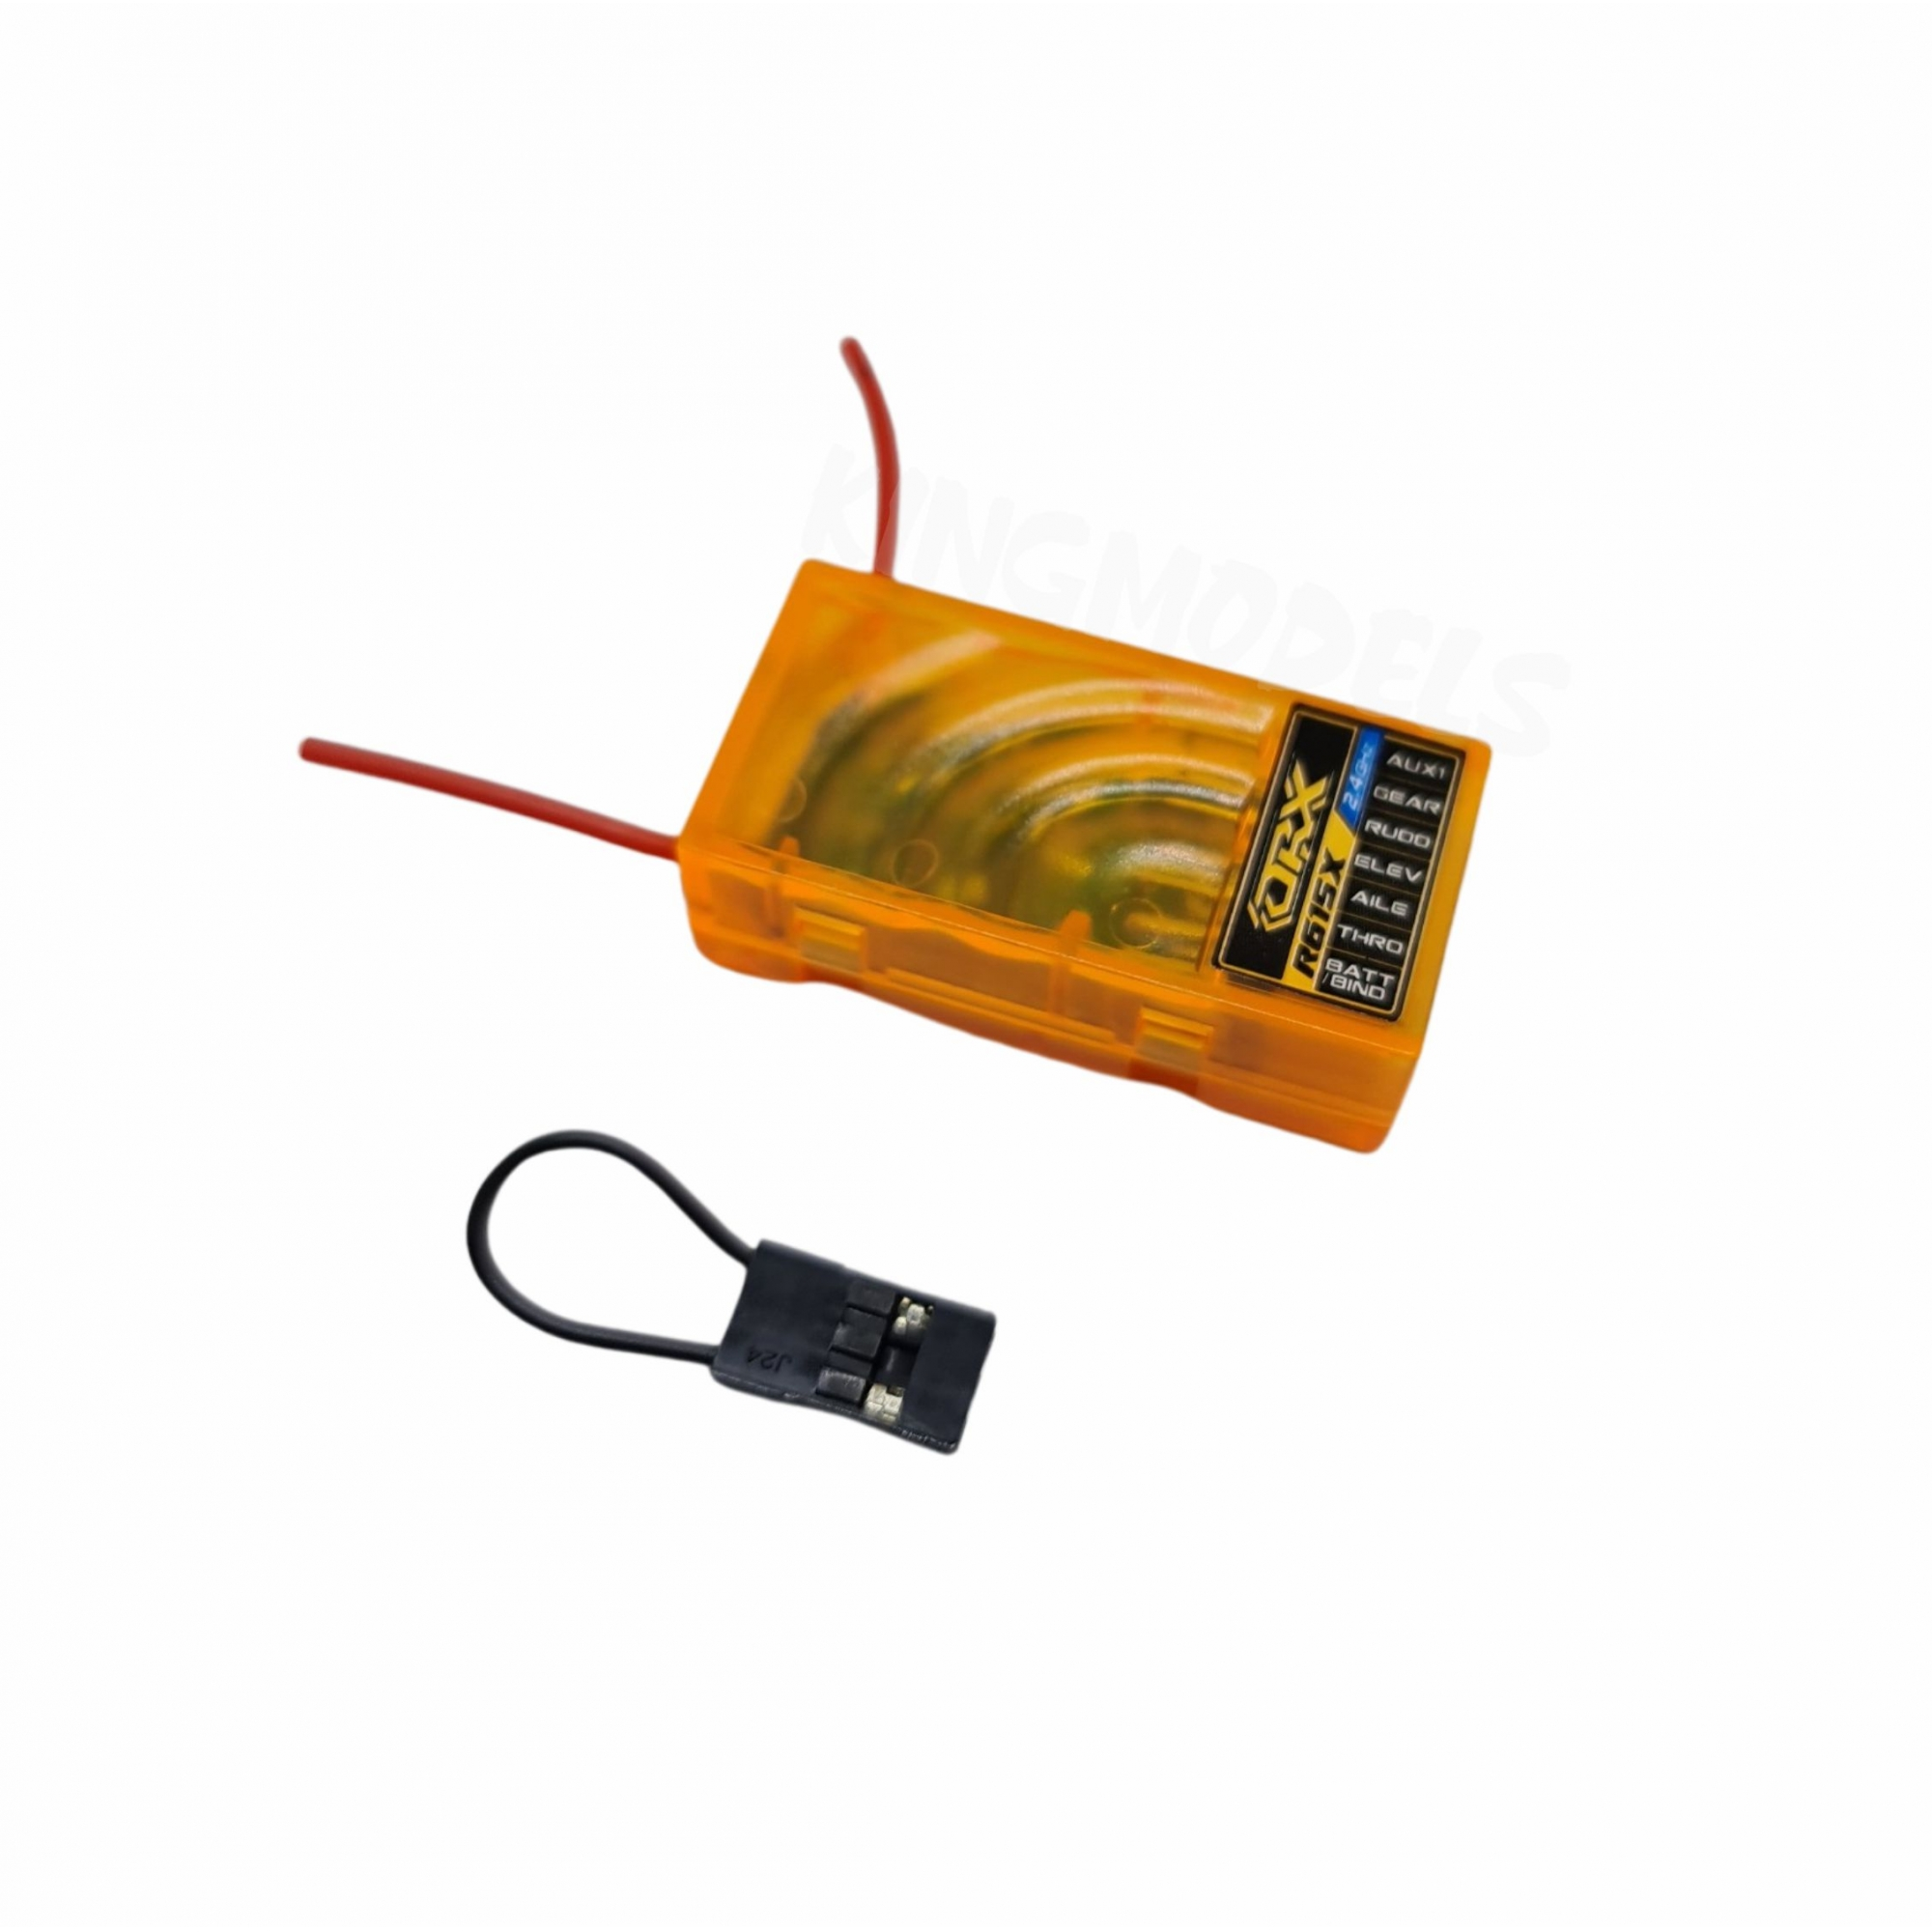 Receptor Orange Spektrum 6ch - R615x Dsm2 Dsmx 6ch Cppm  - King Models